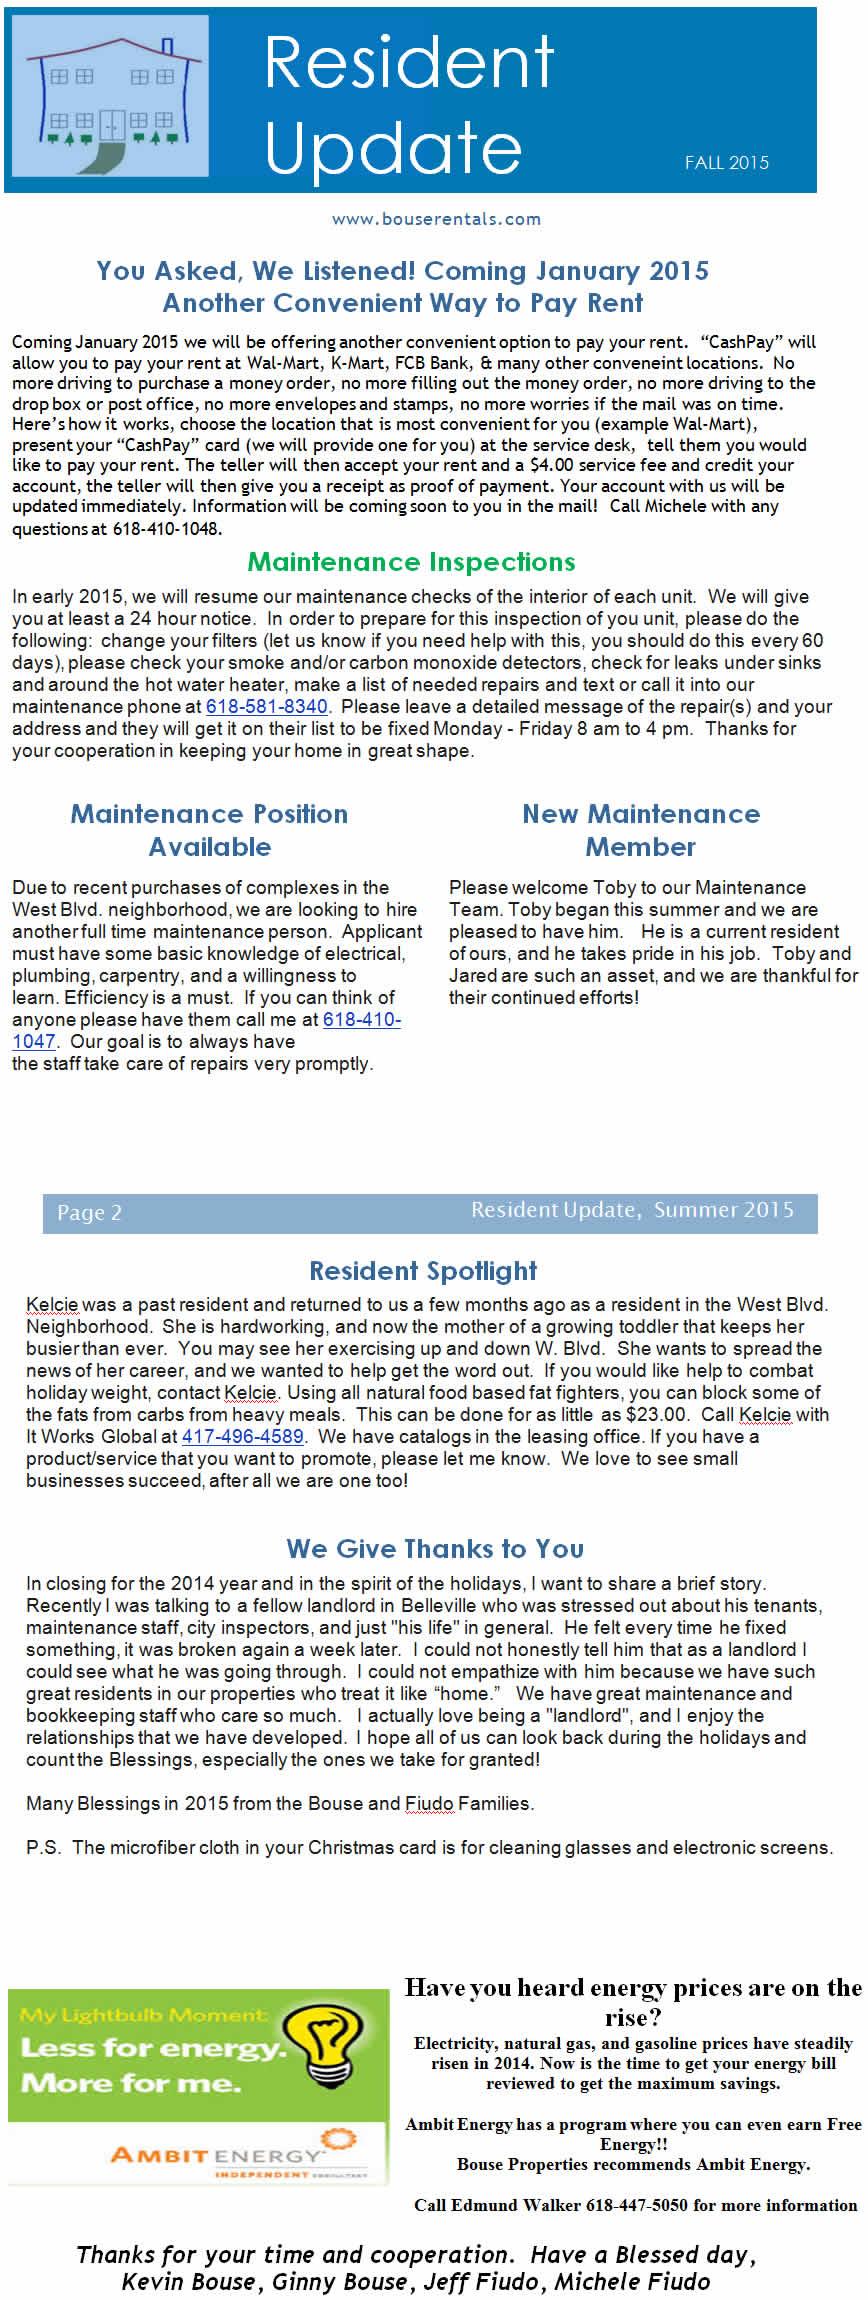 Bouse Properties LLC Newsletter Fall 2015